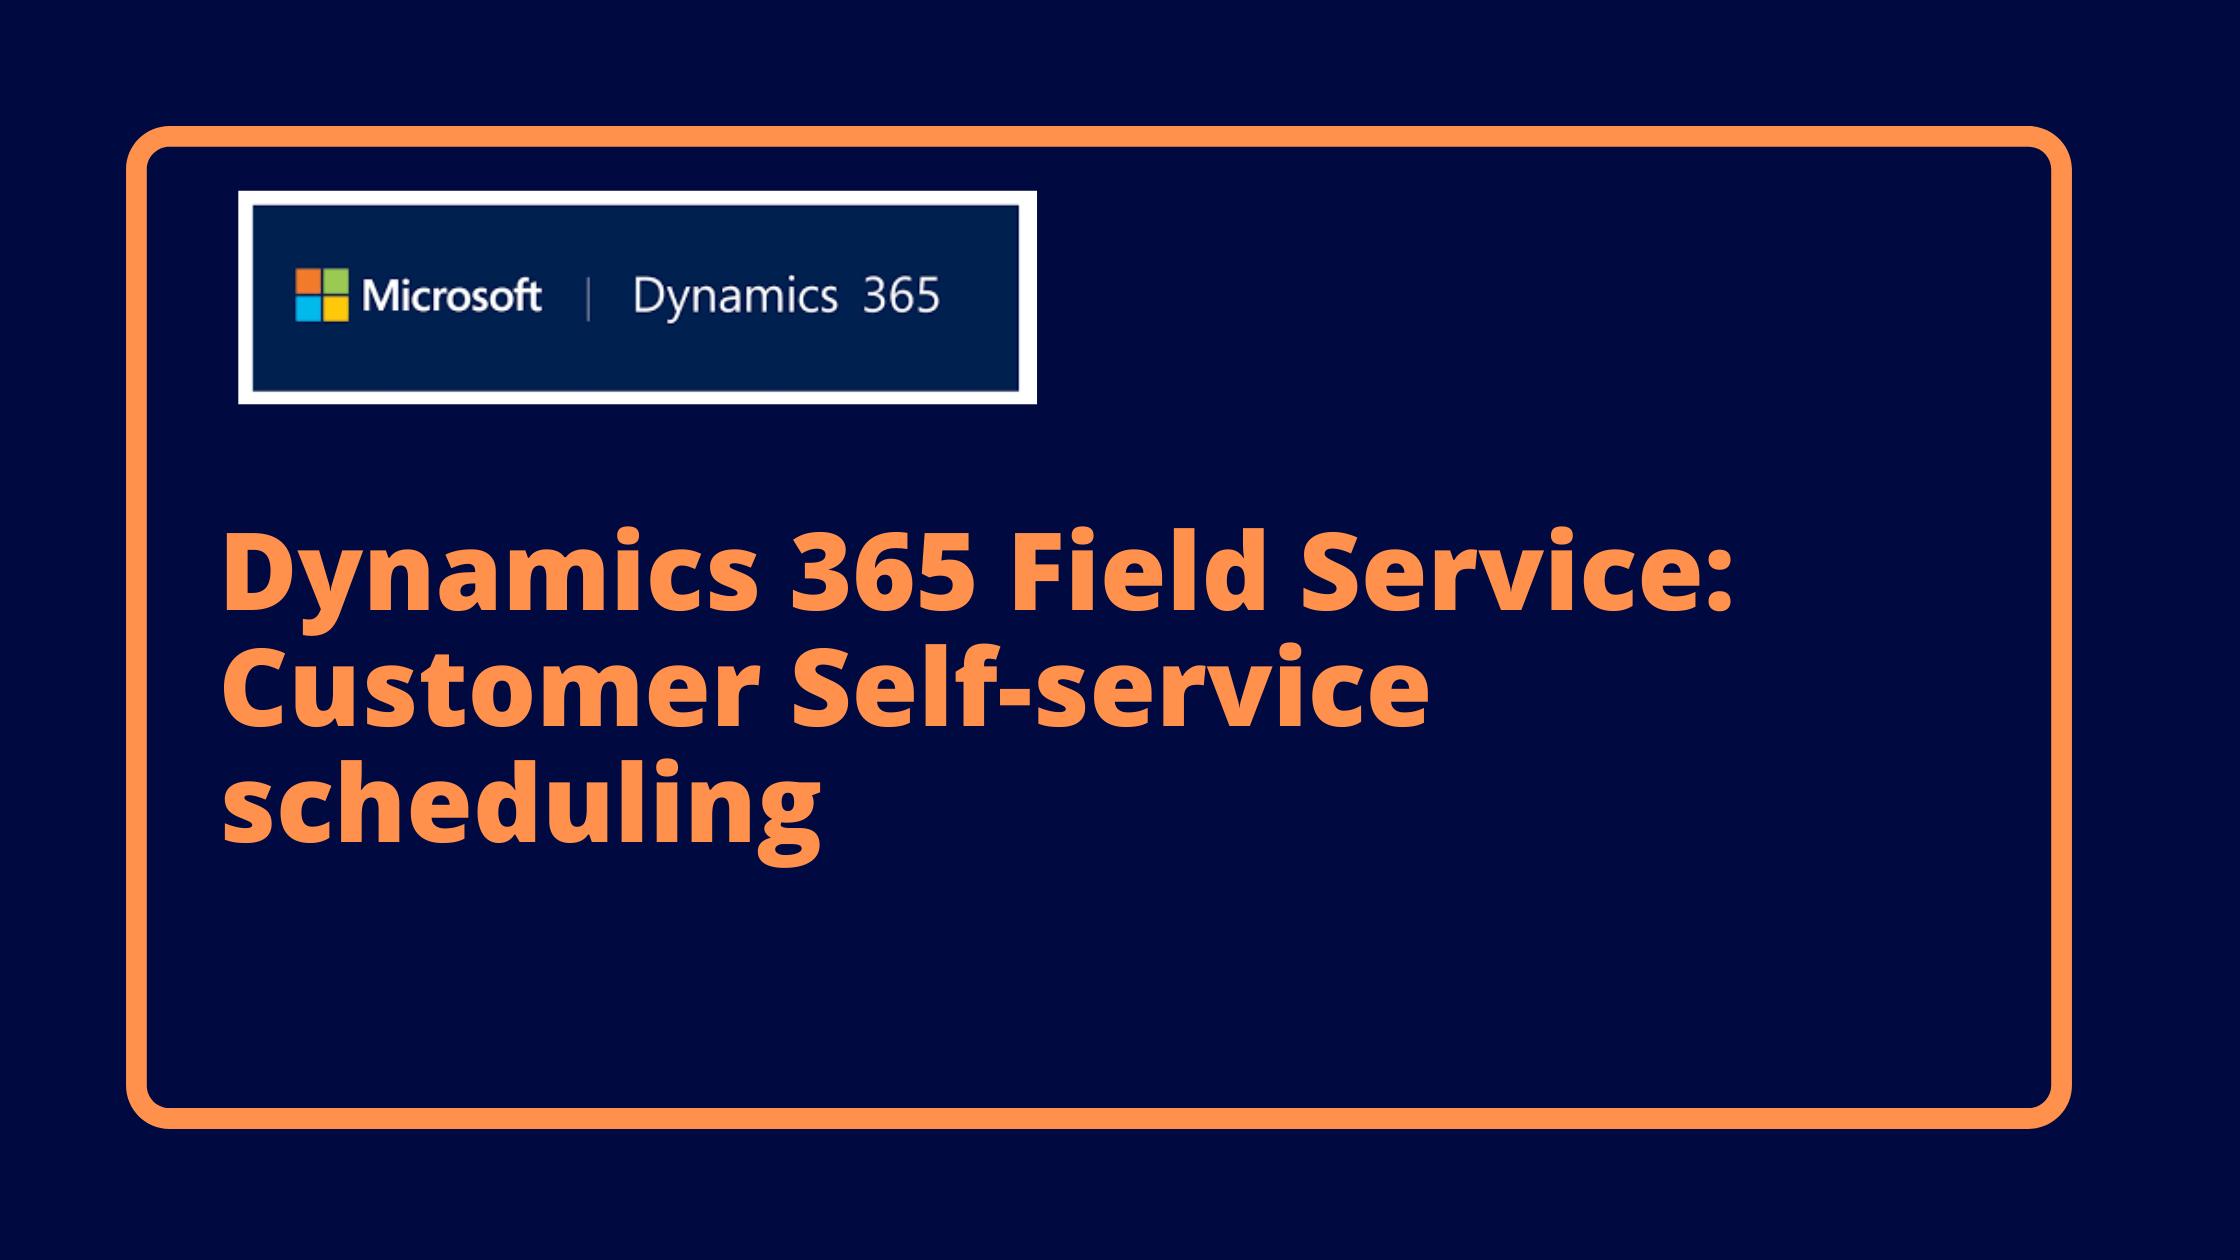 Dynamics 365 Field Service: Customer Self-service scheduling